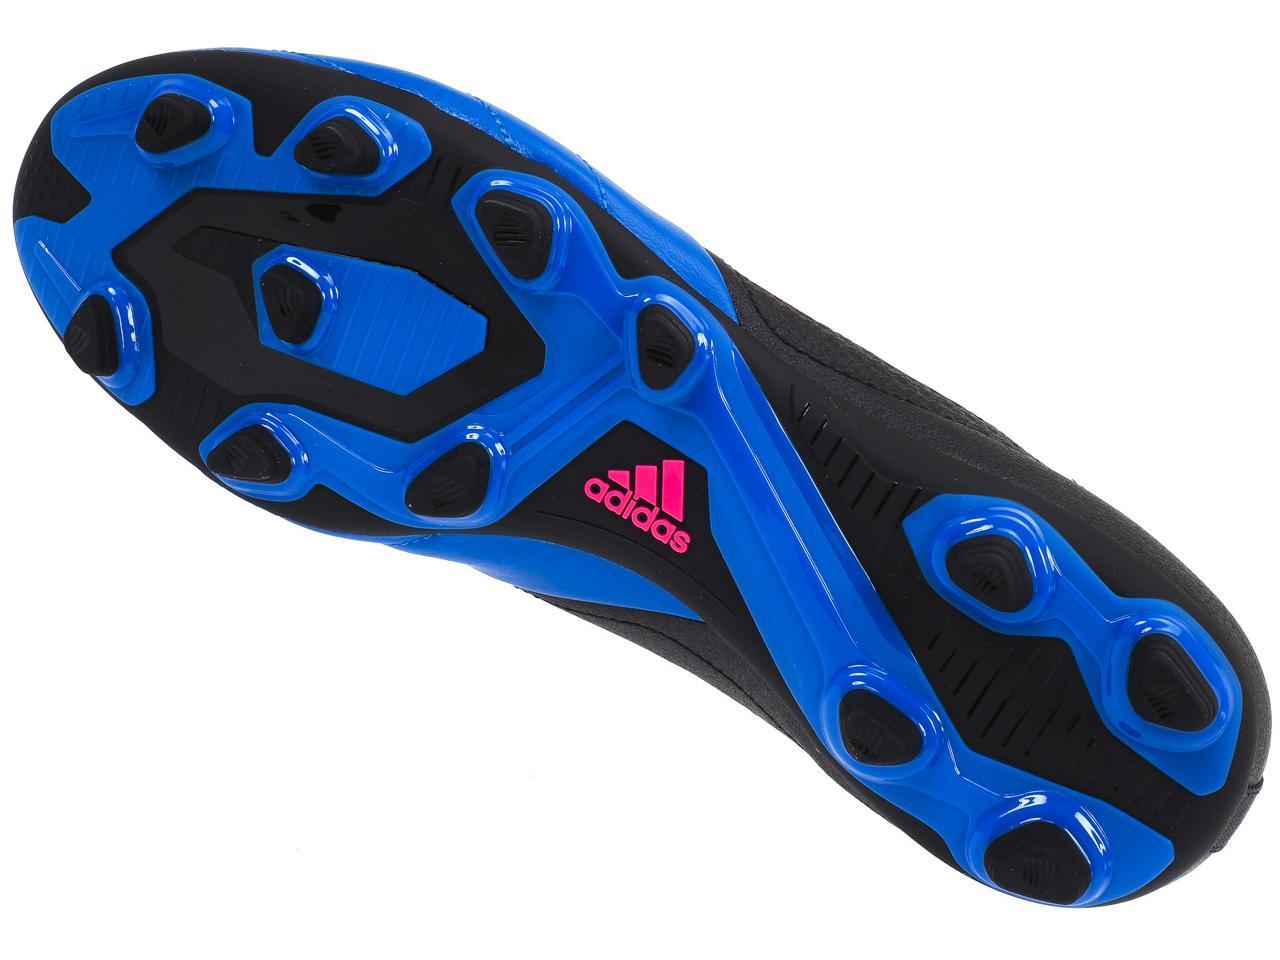 Ace Adidas H Fxg Moulées 38832 174 Football Neuf Chaussures Bleu qtEaT